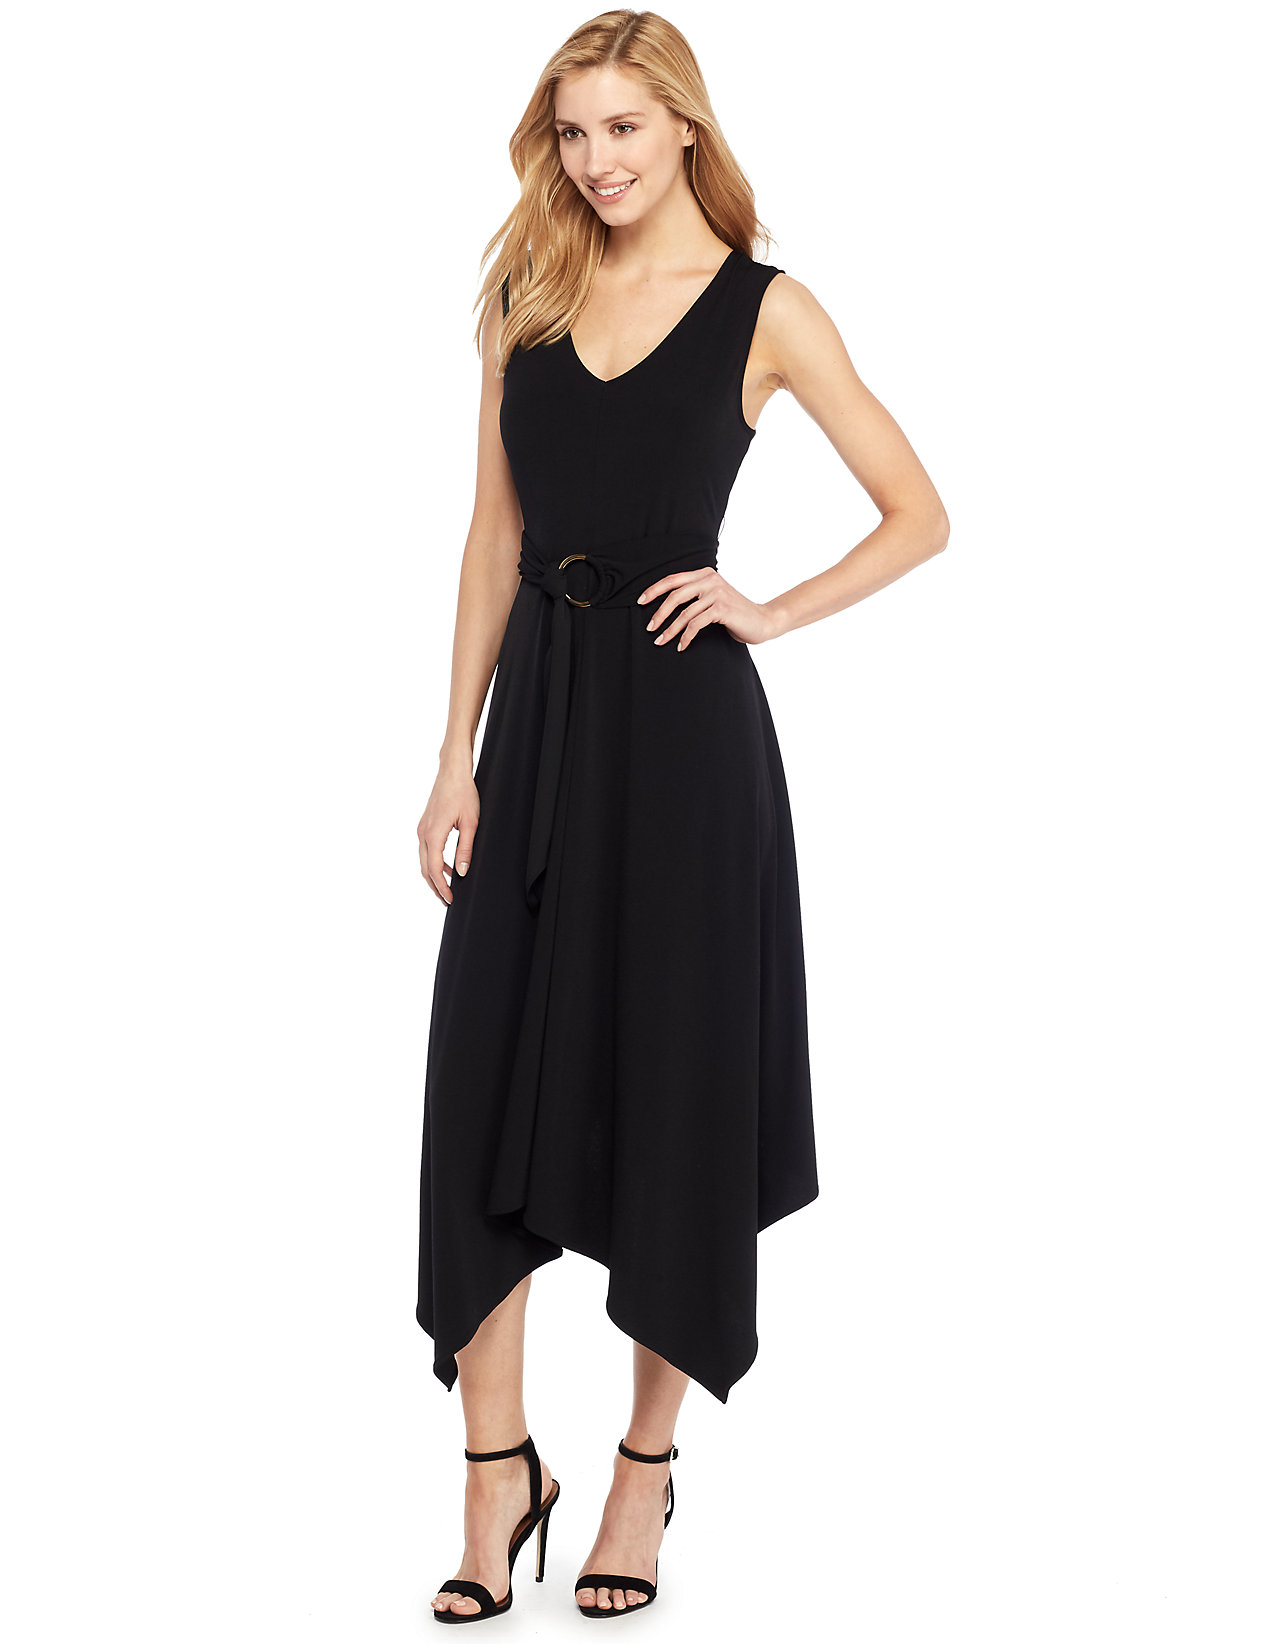 0703014de010 Belk Formal Dresses Clearance